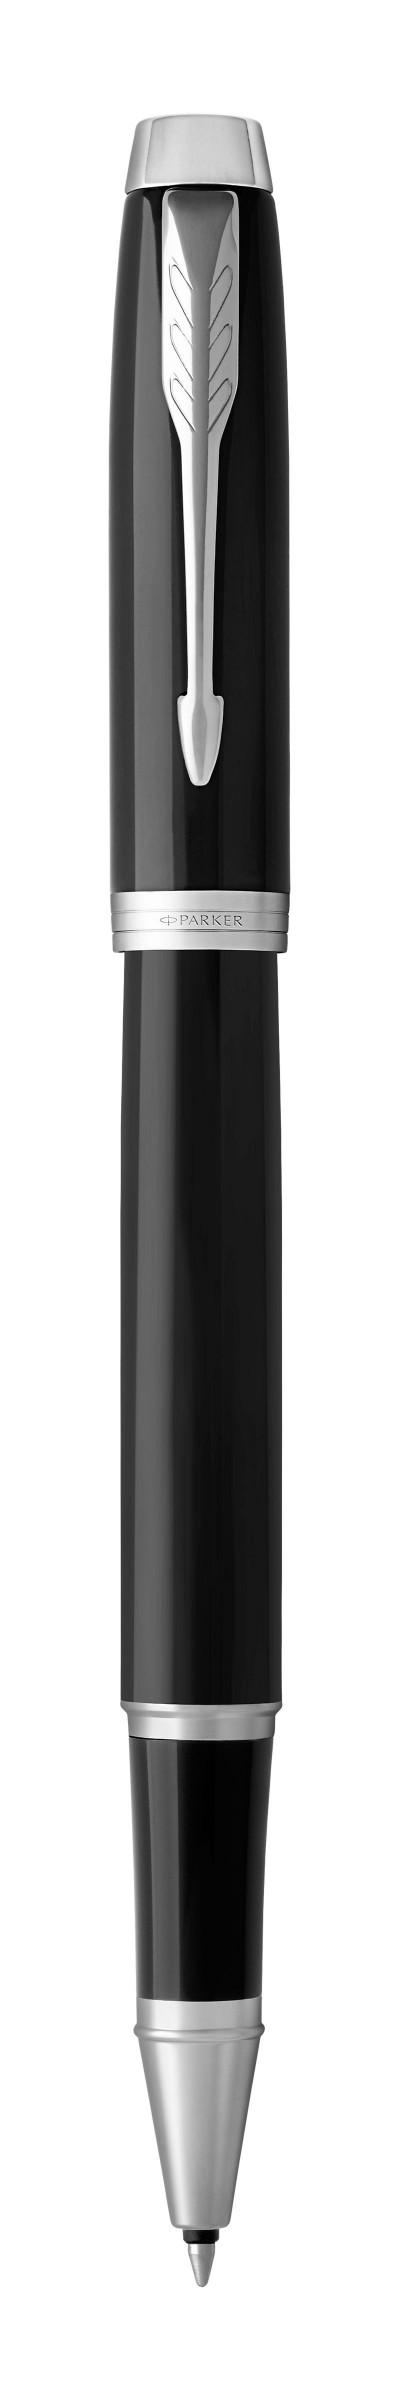 - Parker Royal Im - fekete, ezüst klipsz 1931658 - rollertoll